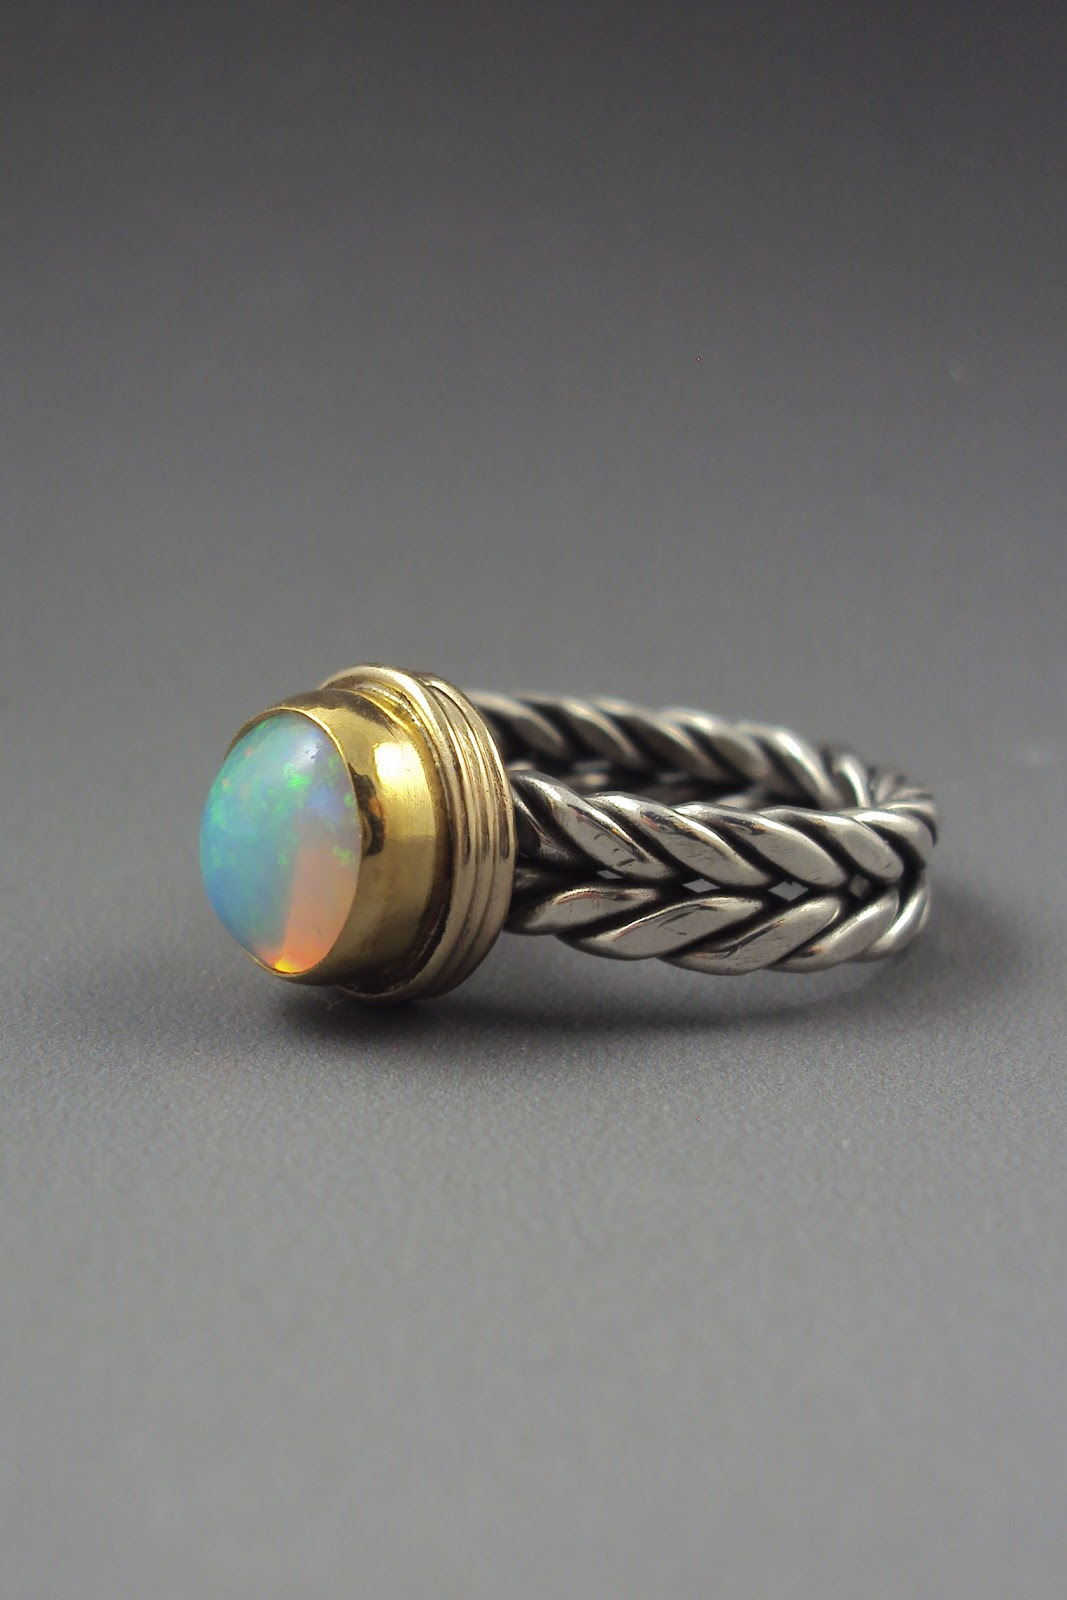 Dana Evans Studio Blog: Twisting Wire Shanks